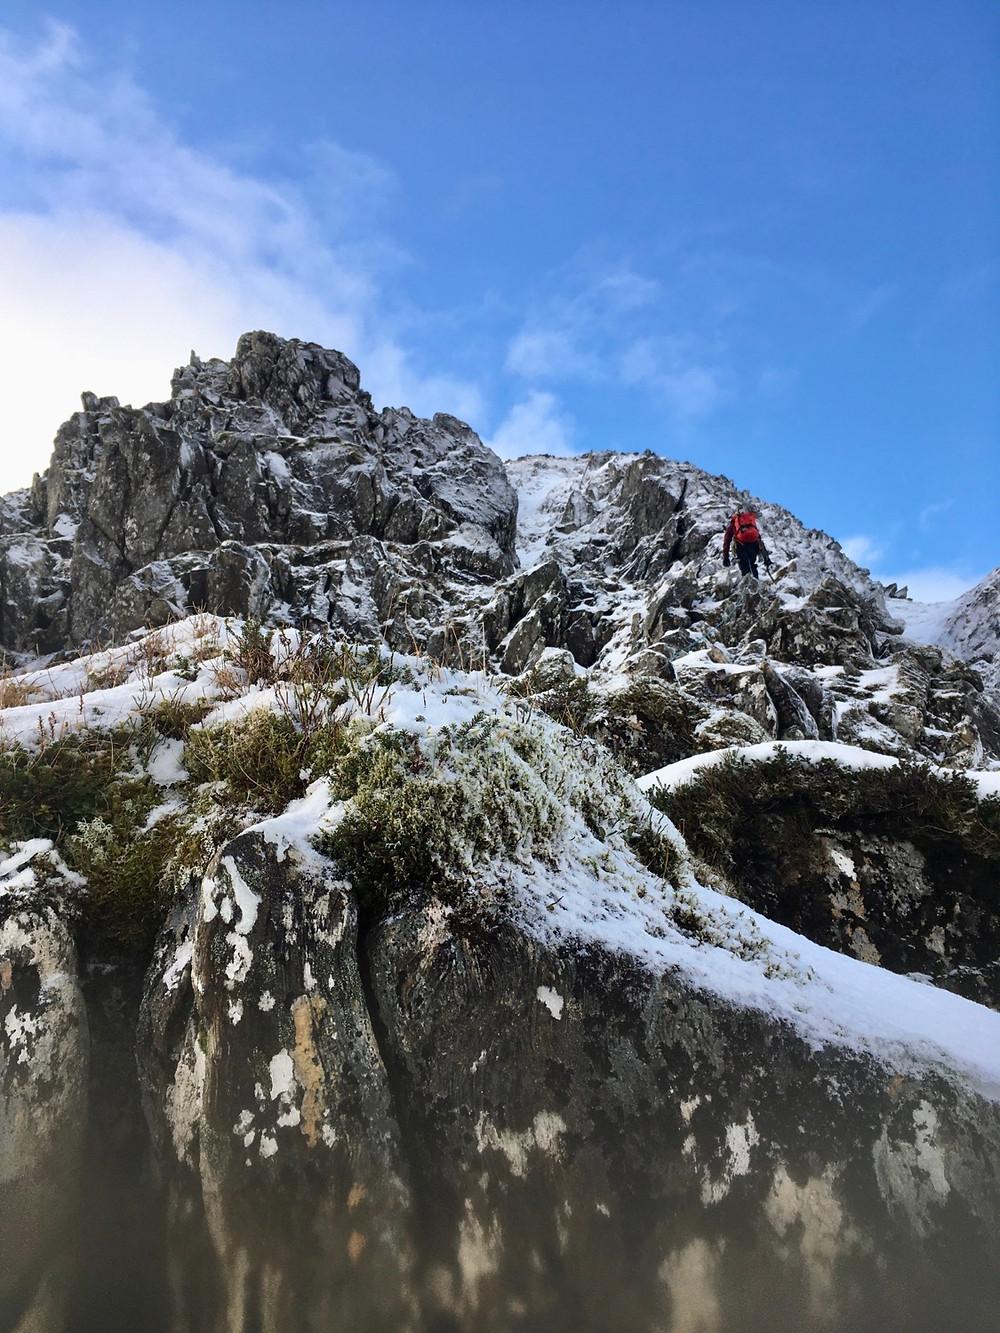 Guided winter climbing on Ben Nevis